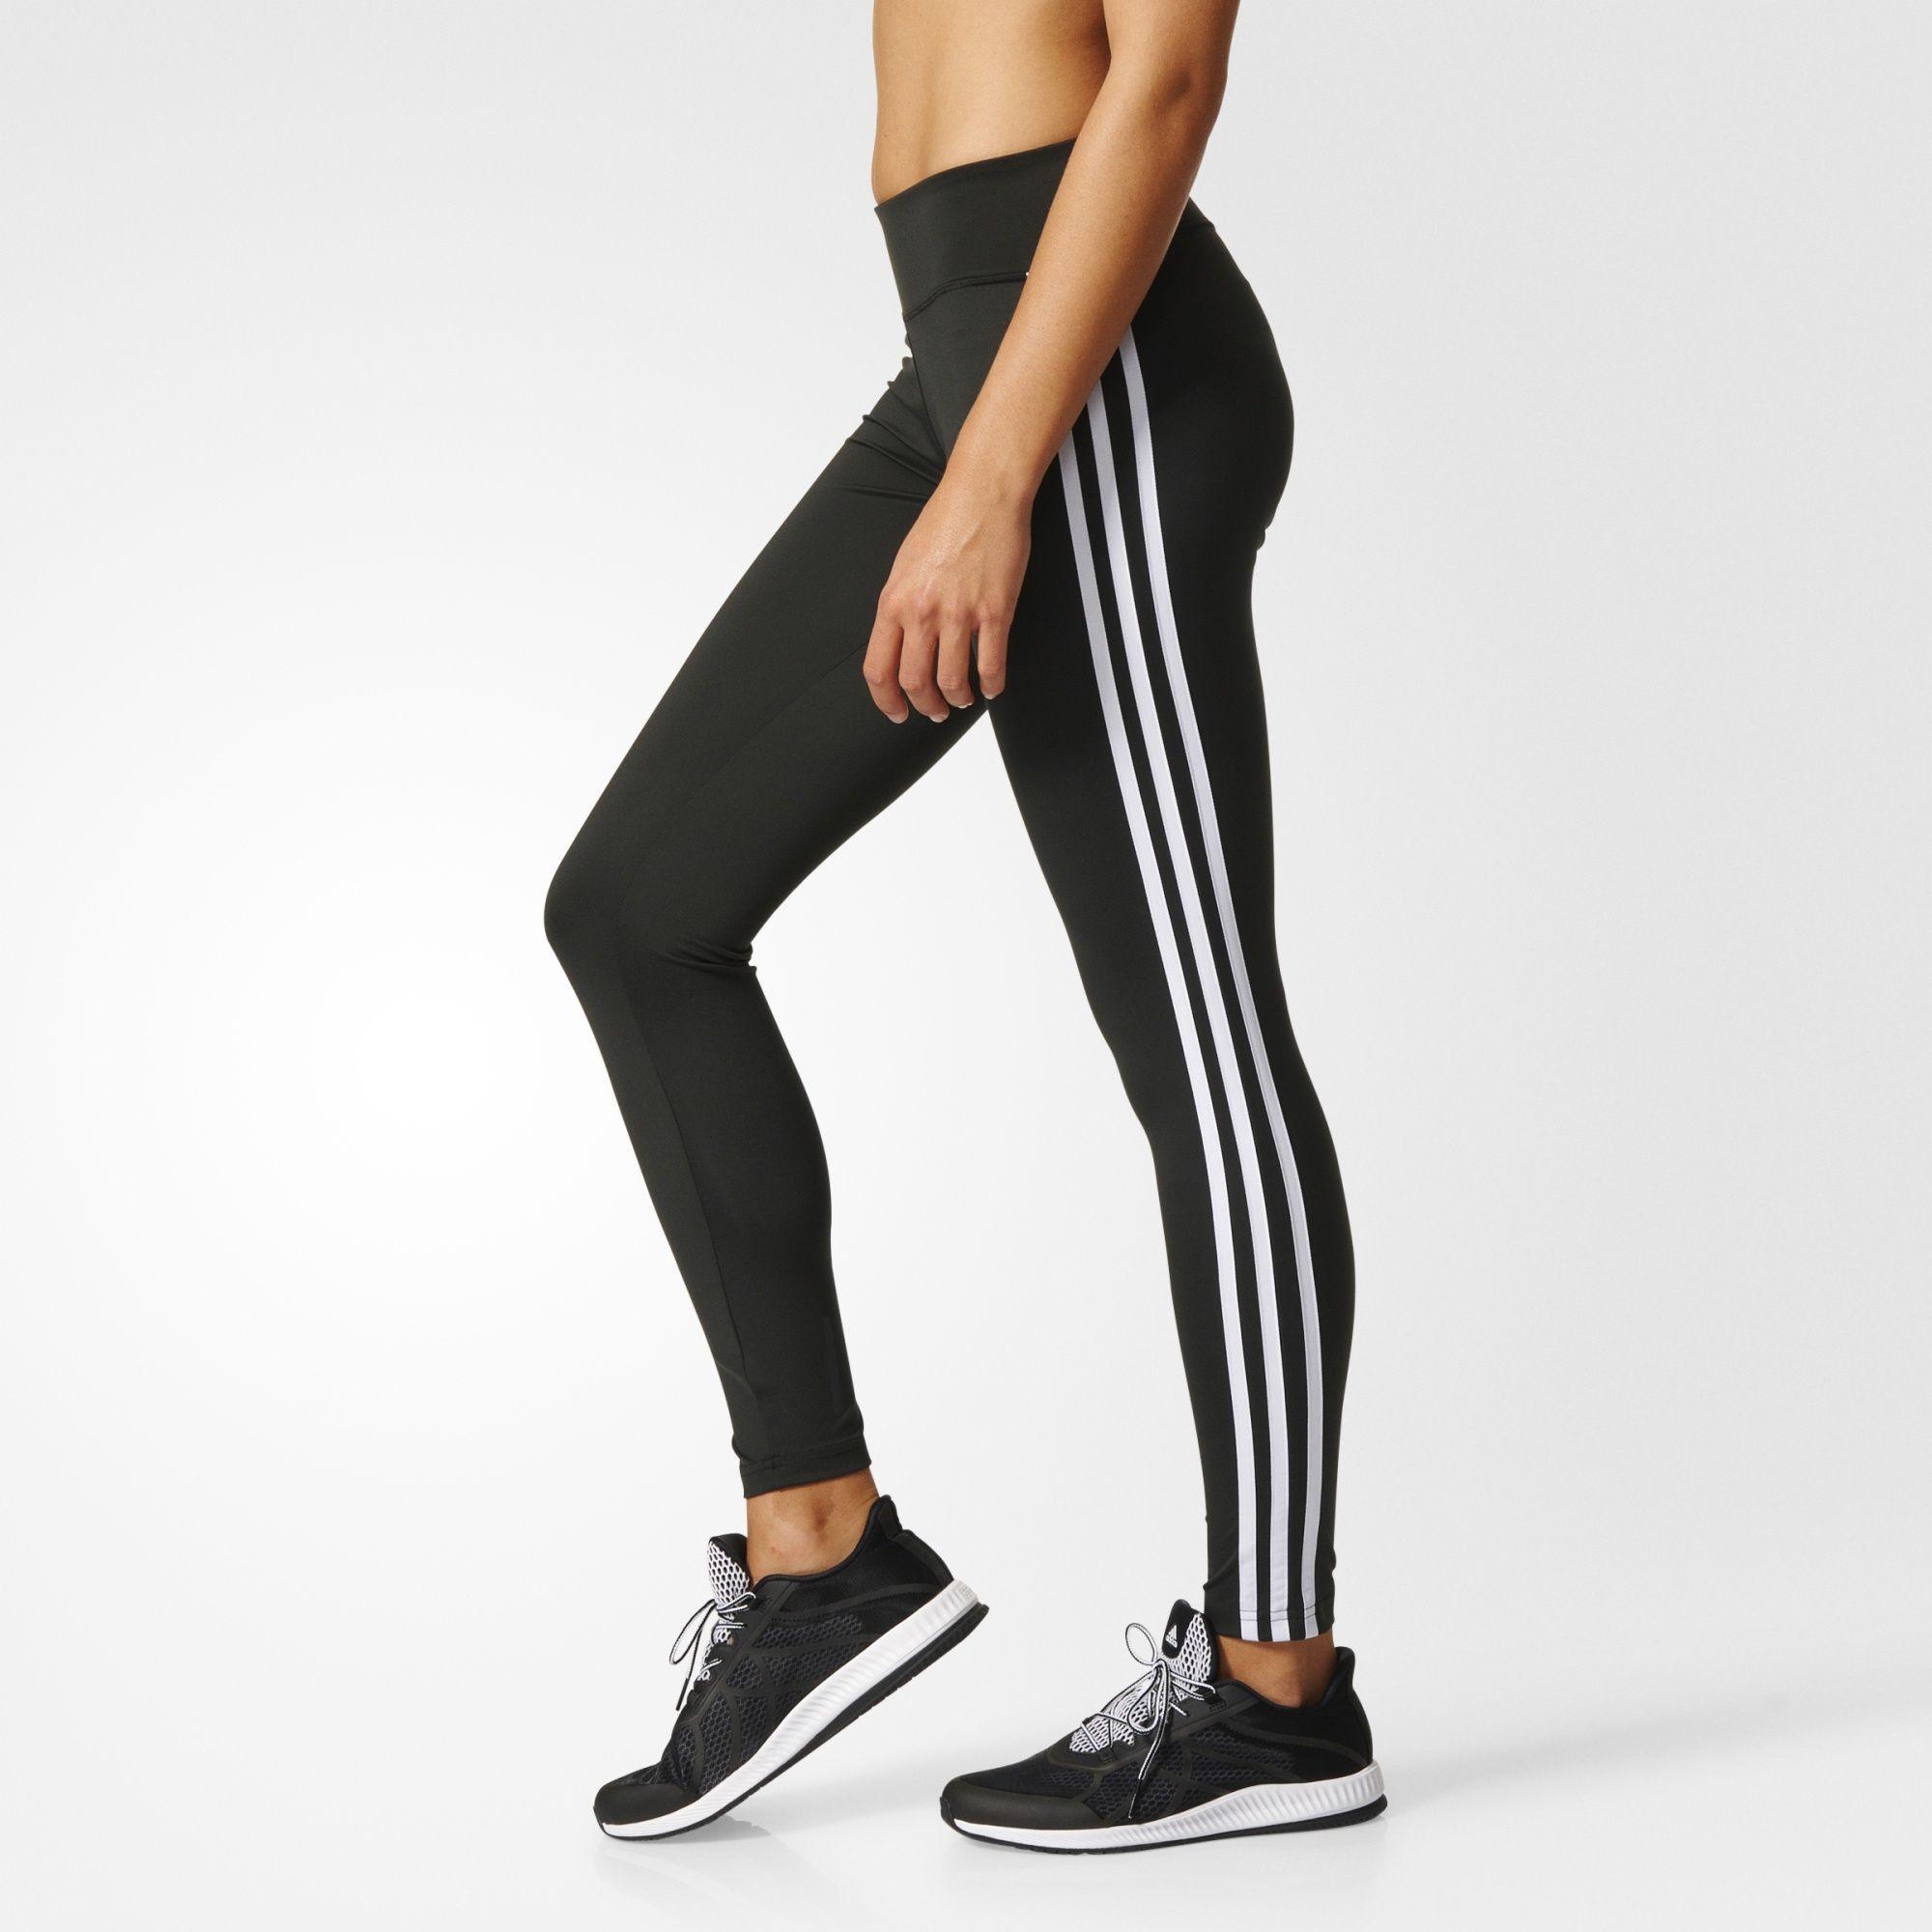 a883baab2 adidas, Adidas tights, tights, 3 stripes, striper, treningstights ...